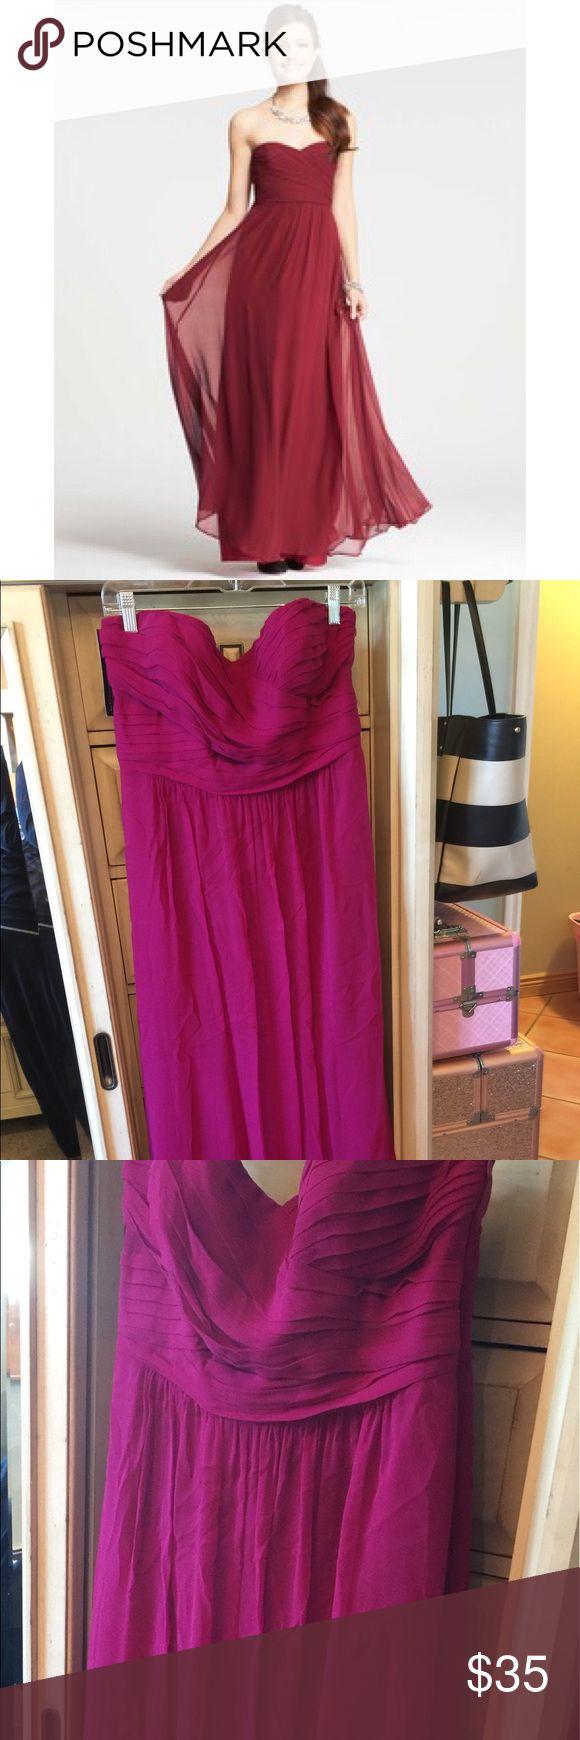 Ann Taylor silk georgette dress (magenta pink) Magenta color, floor length, ann taylor weddings collection. Ann Taylor Dresses Wedding